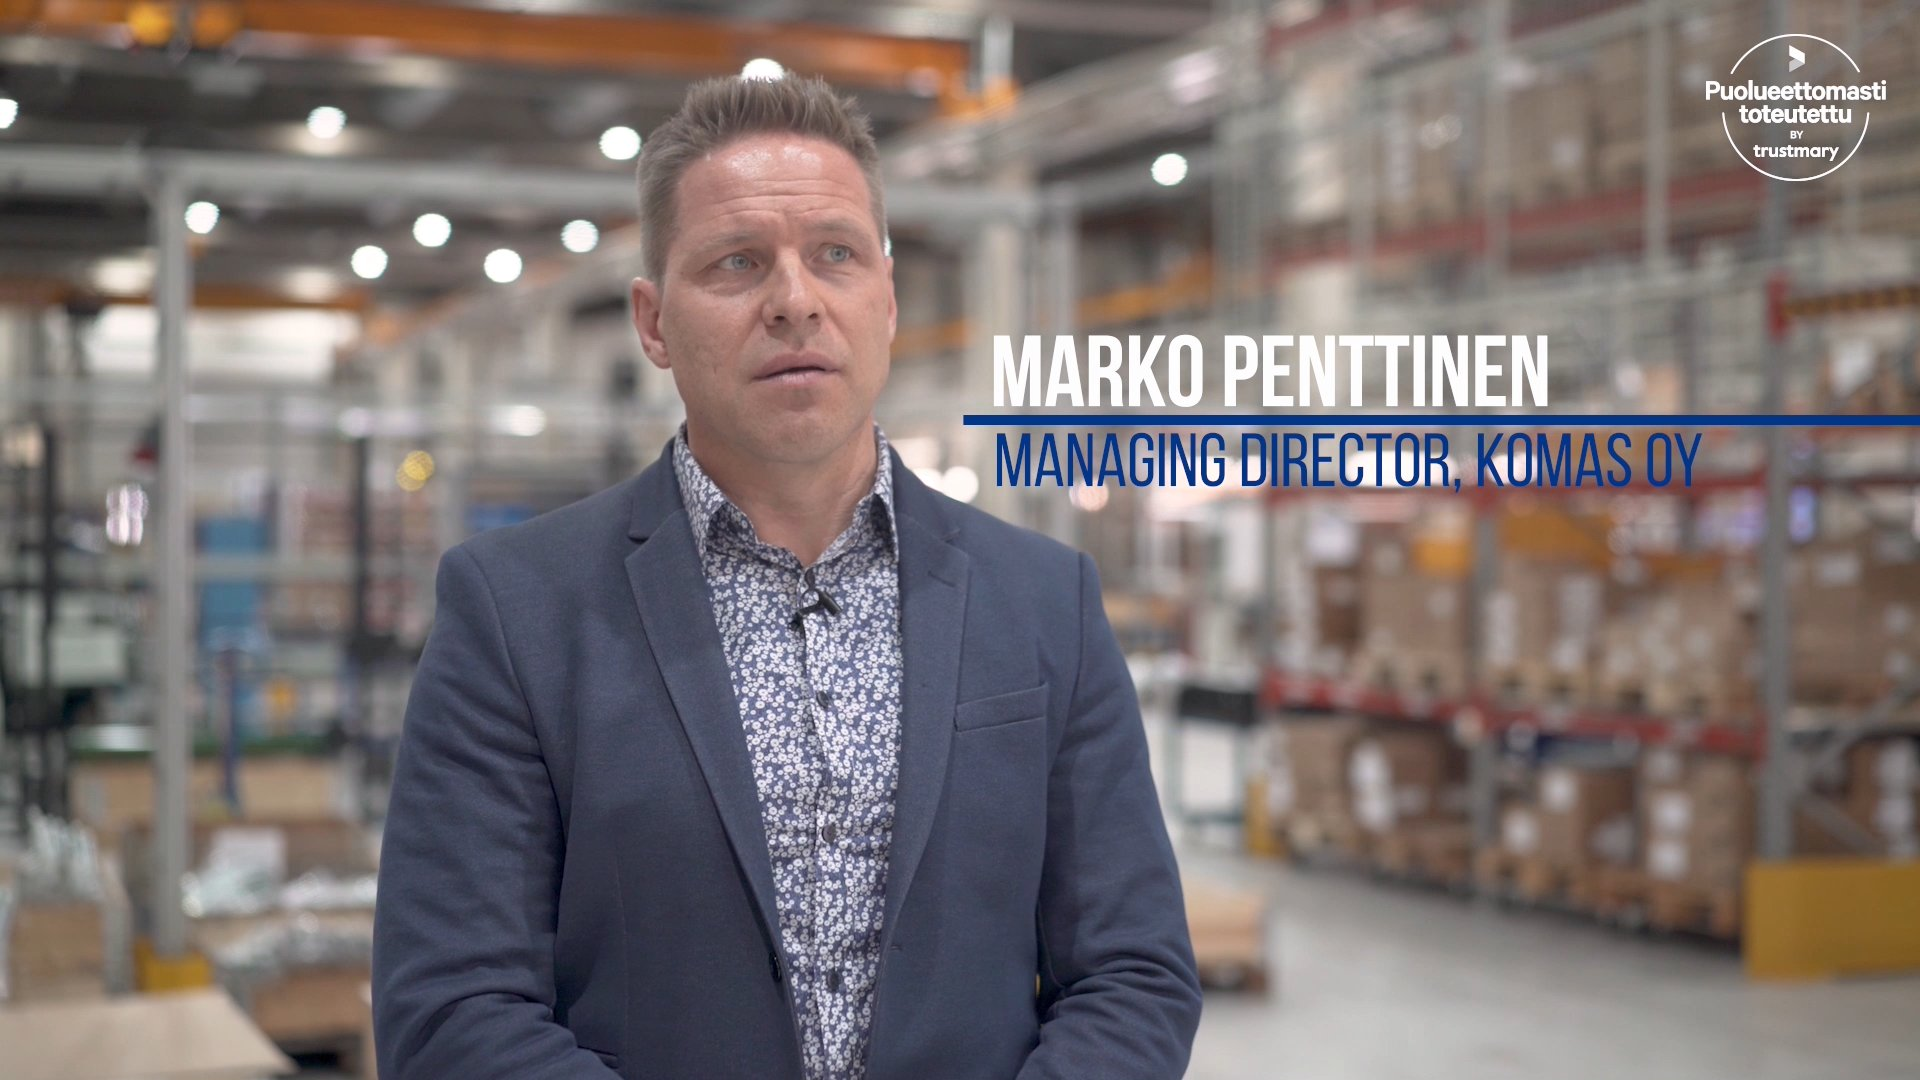 Marko Penttinen, CEO, Komas